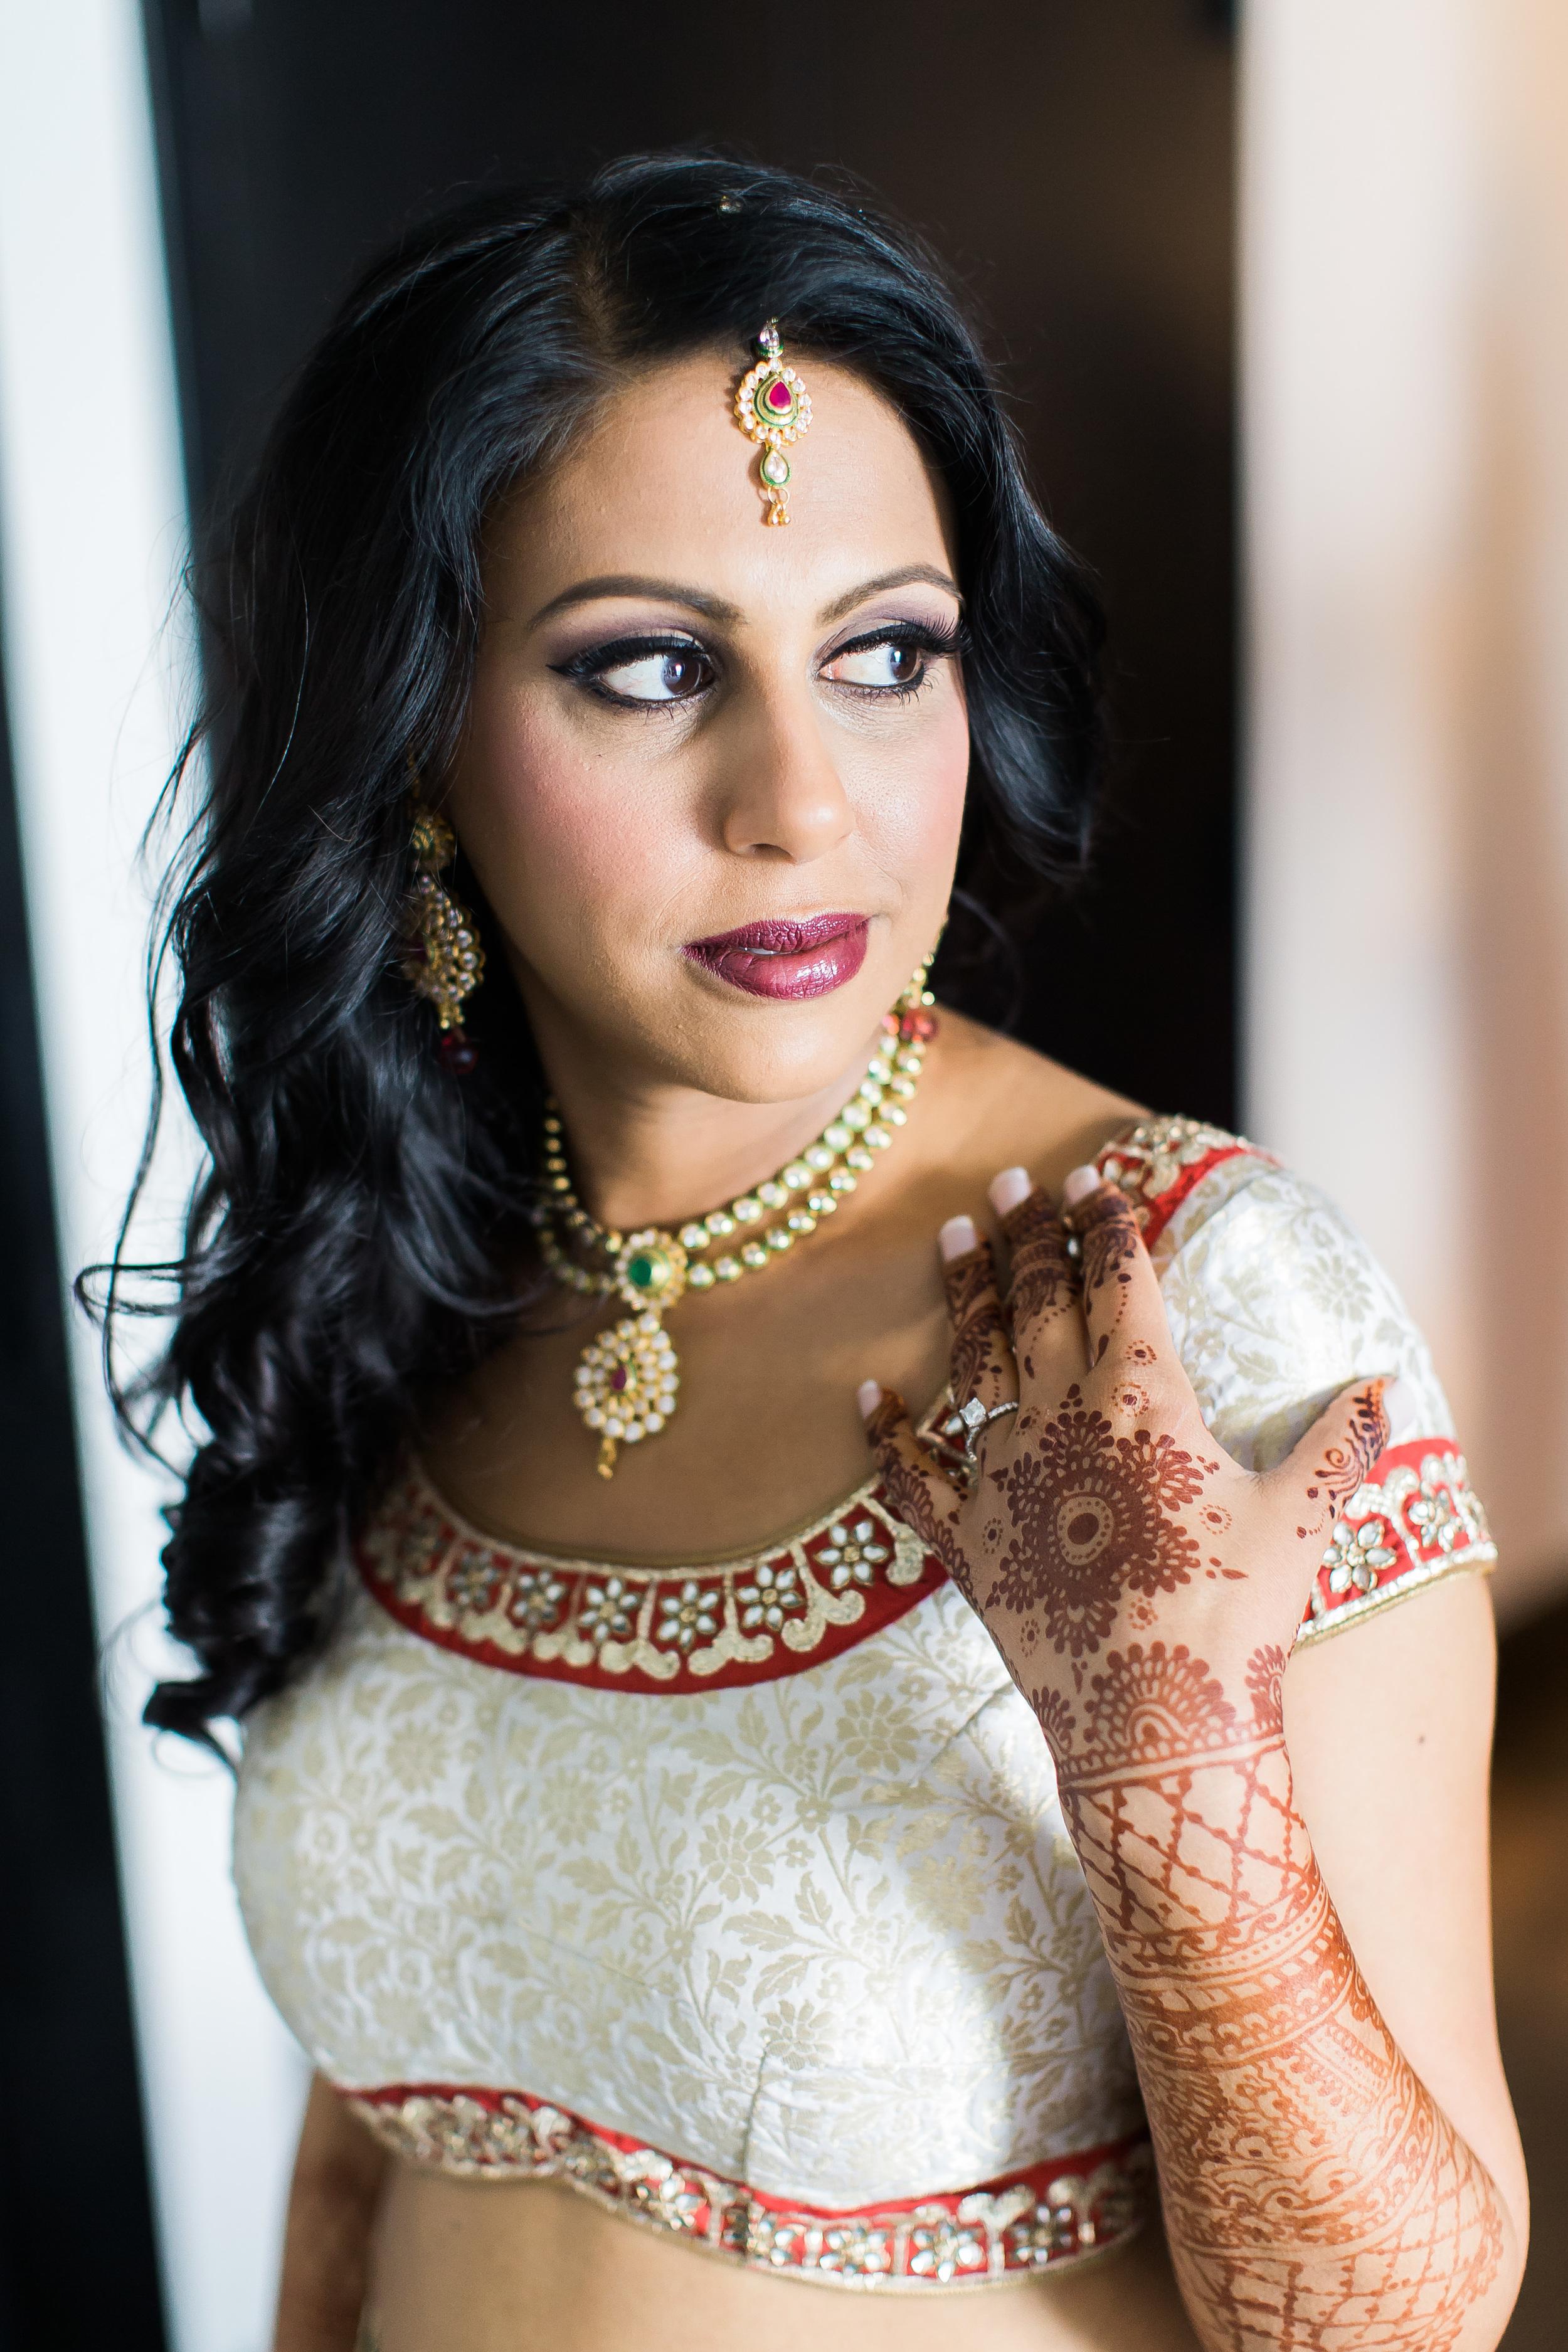 Palm Beach Wedding at Tideline Ocean Resort | Gerilyn Gianna Event and Floral Design